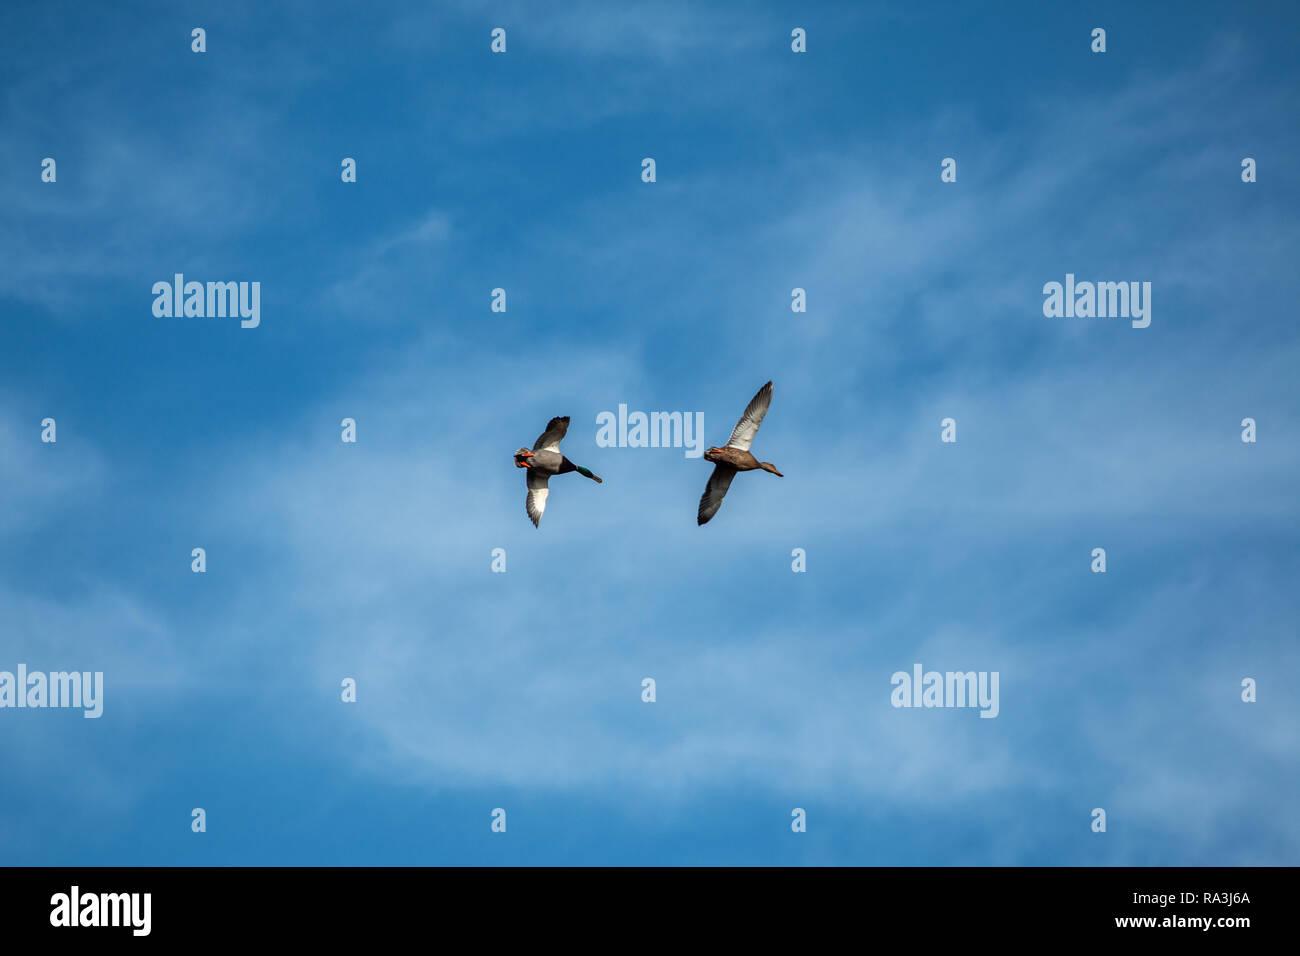 male and female mallard ducks in flight - Stock Image